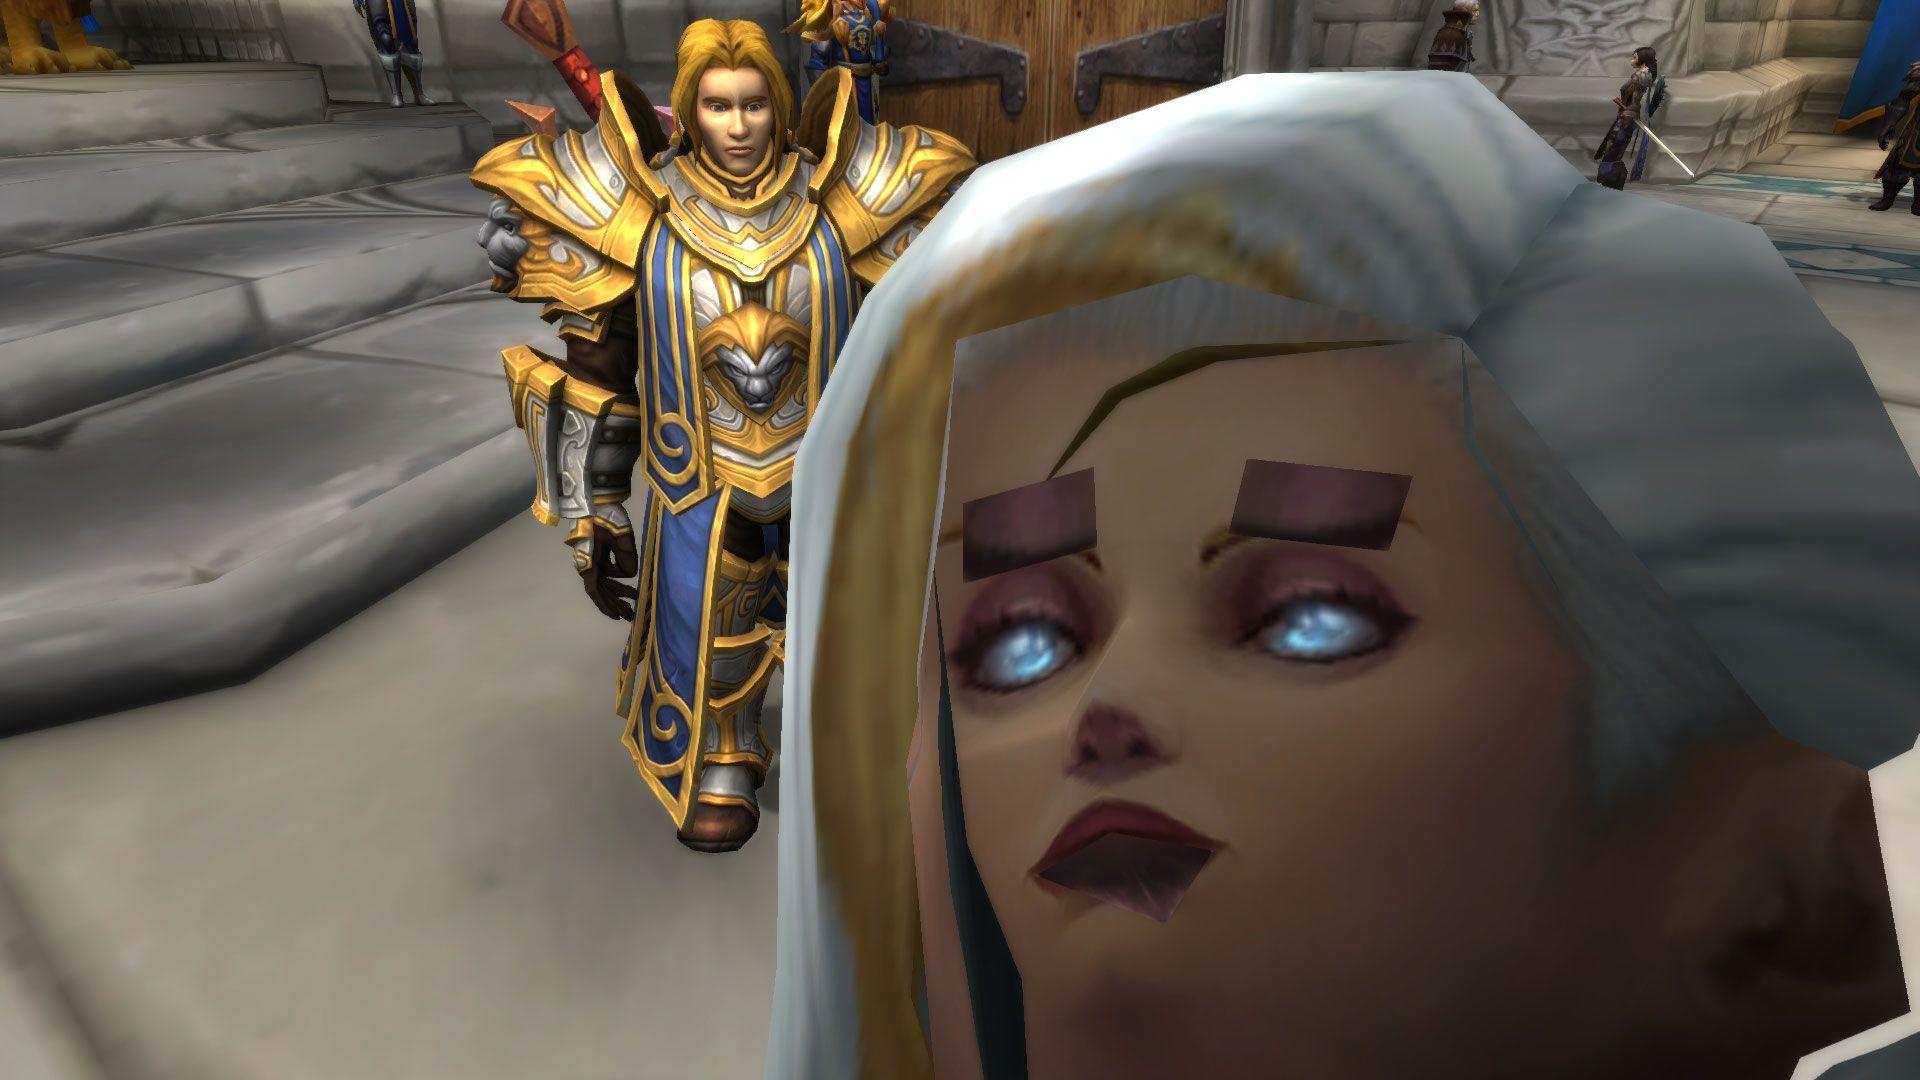 World Of Warcraft Wallpaper Bfa: I Accidentally Walked Into Jaina On BfA Alpha And This